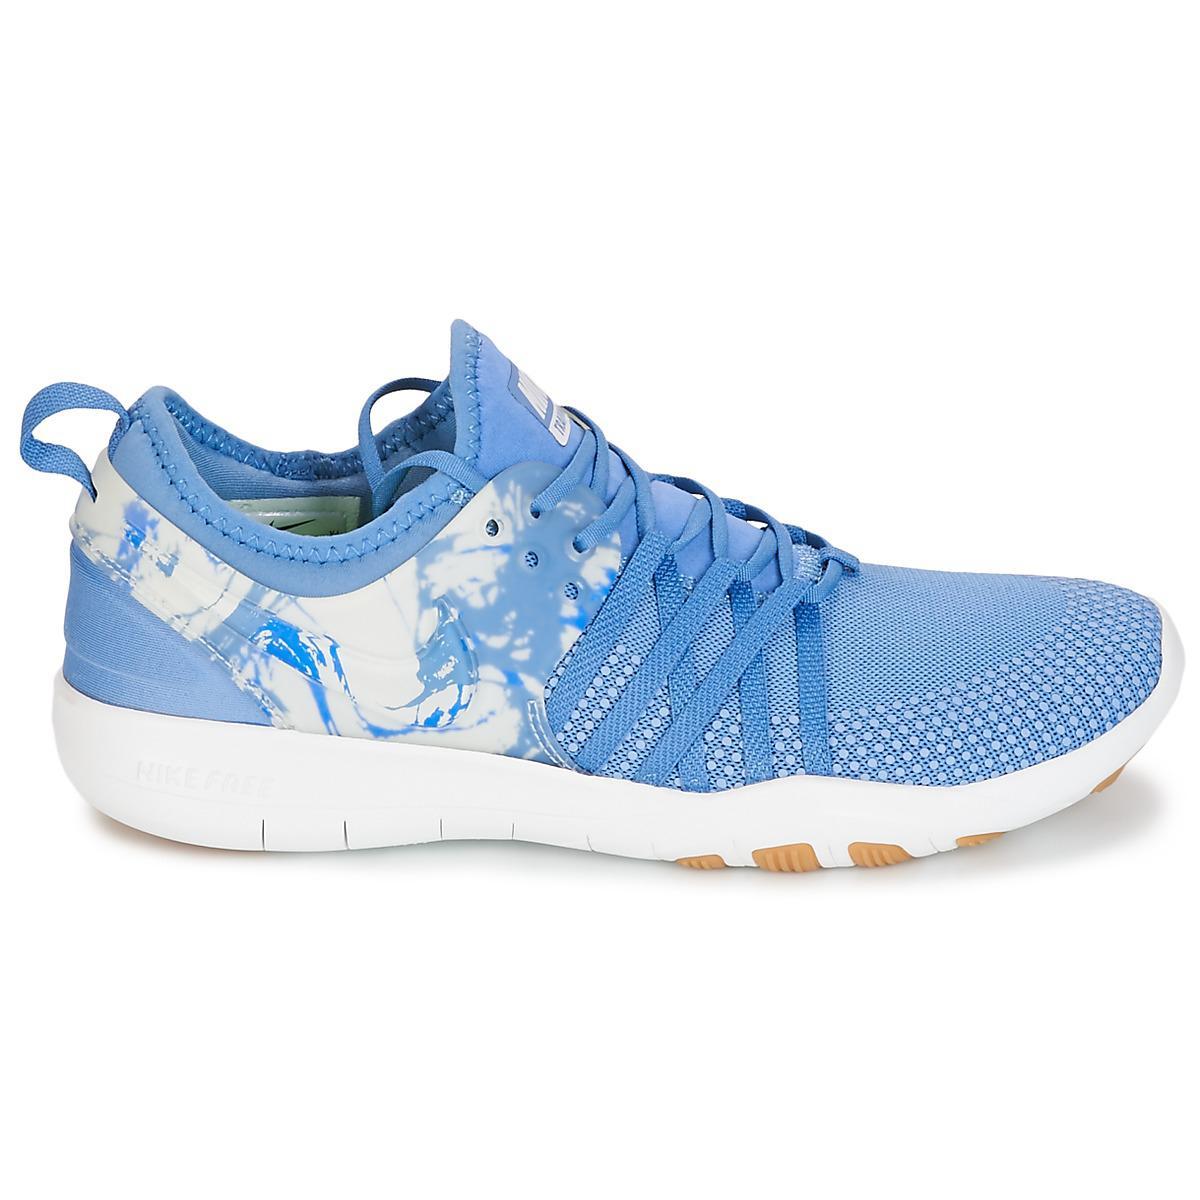 98ee31717e8b ... czech nike free trainer 7 womens trainers in blue lyst. view fullscreen  3e7cd 791d5